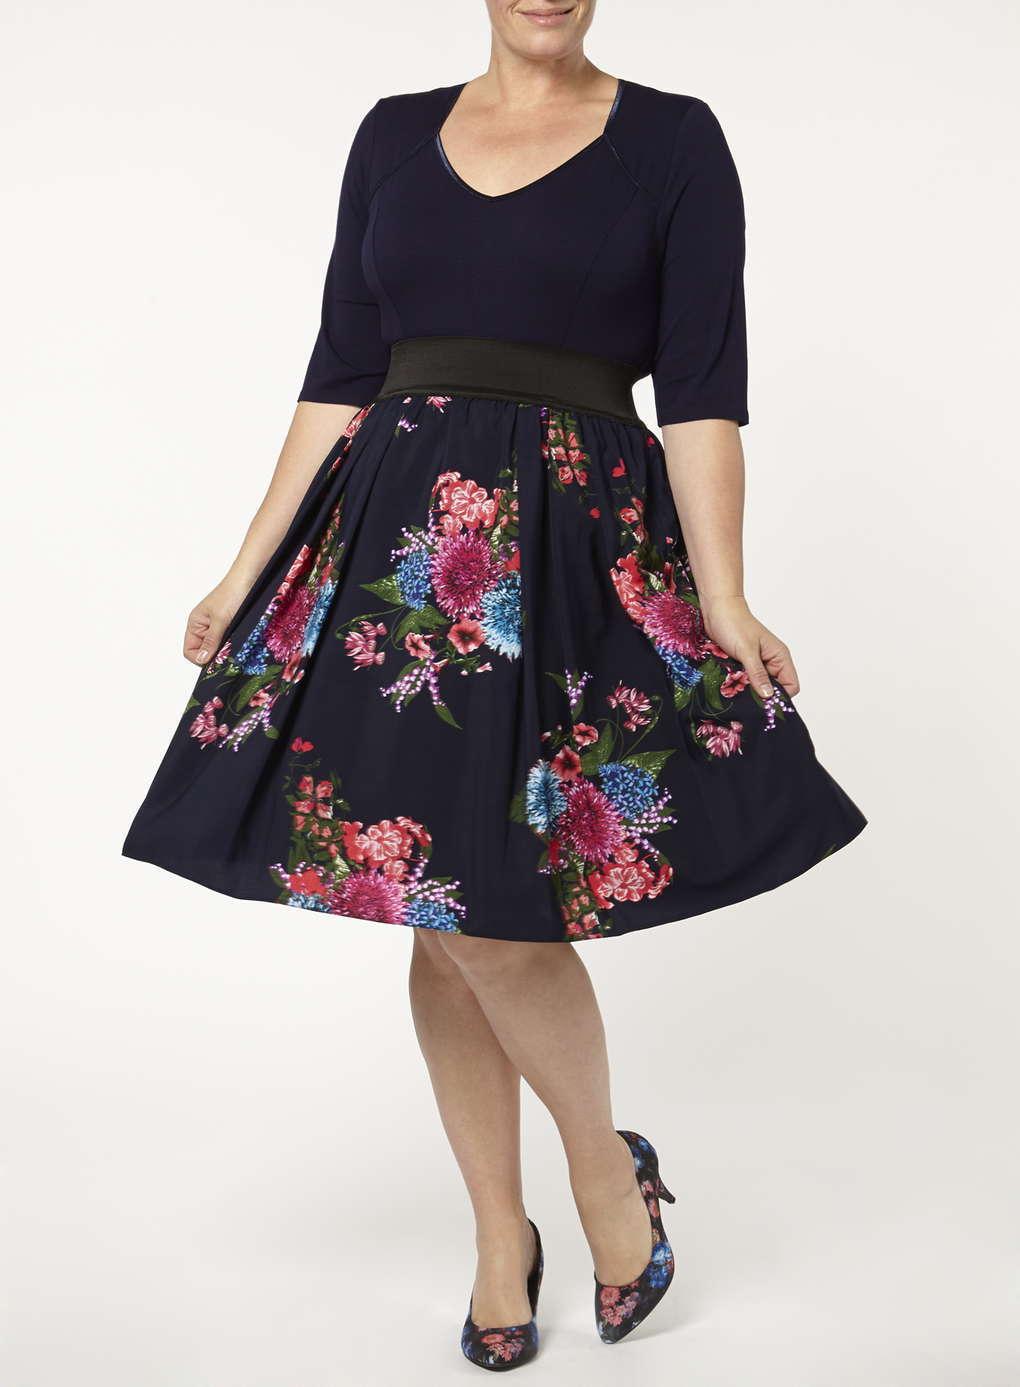 Kleid Gr.50 Midikleid Sommerkleid Stretchkleid Blüten blau Plus Größe Scarlett&Jo